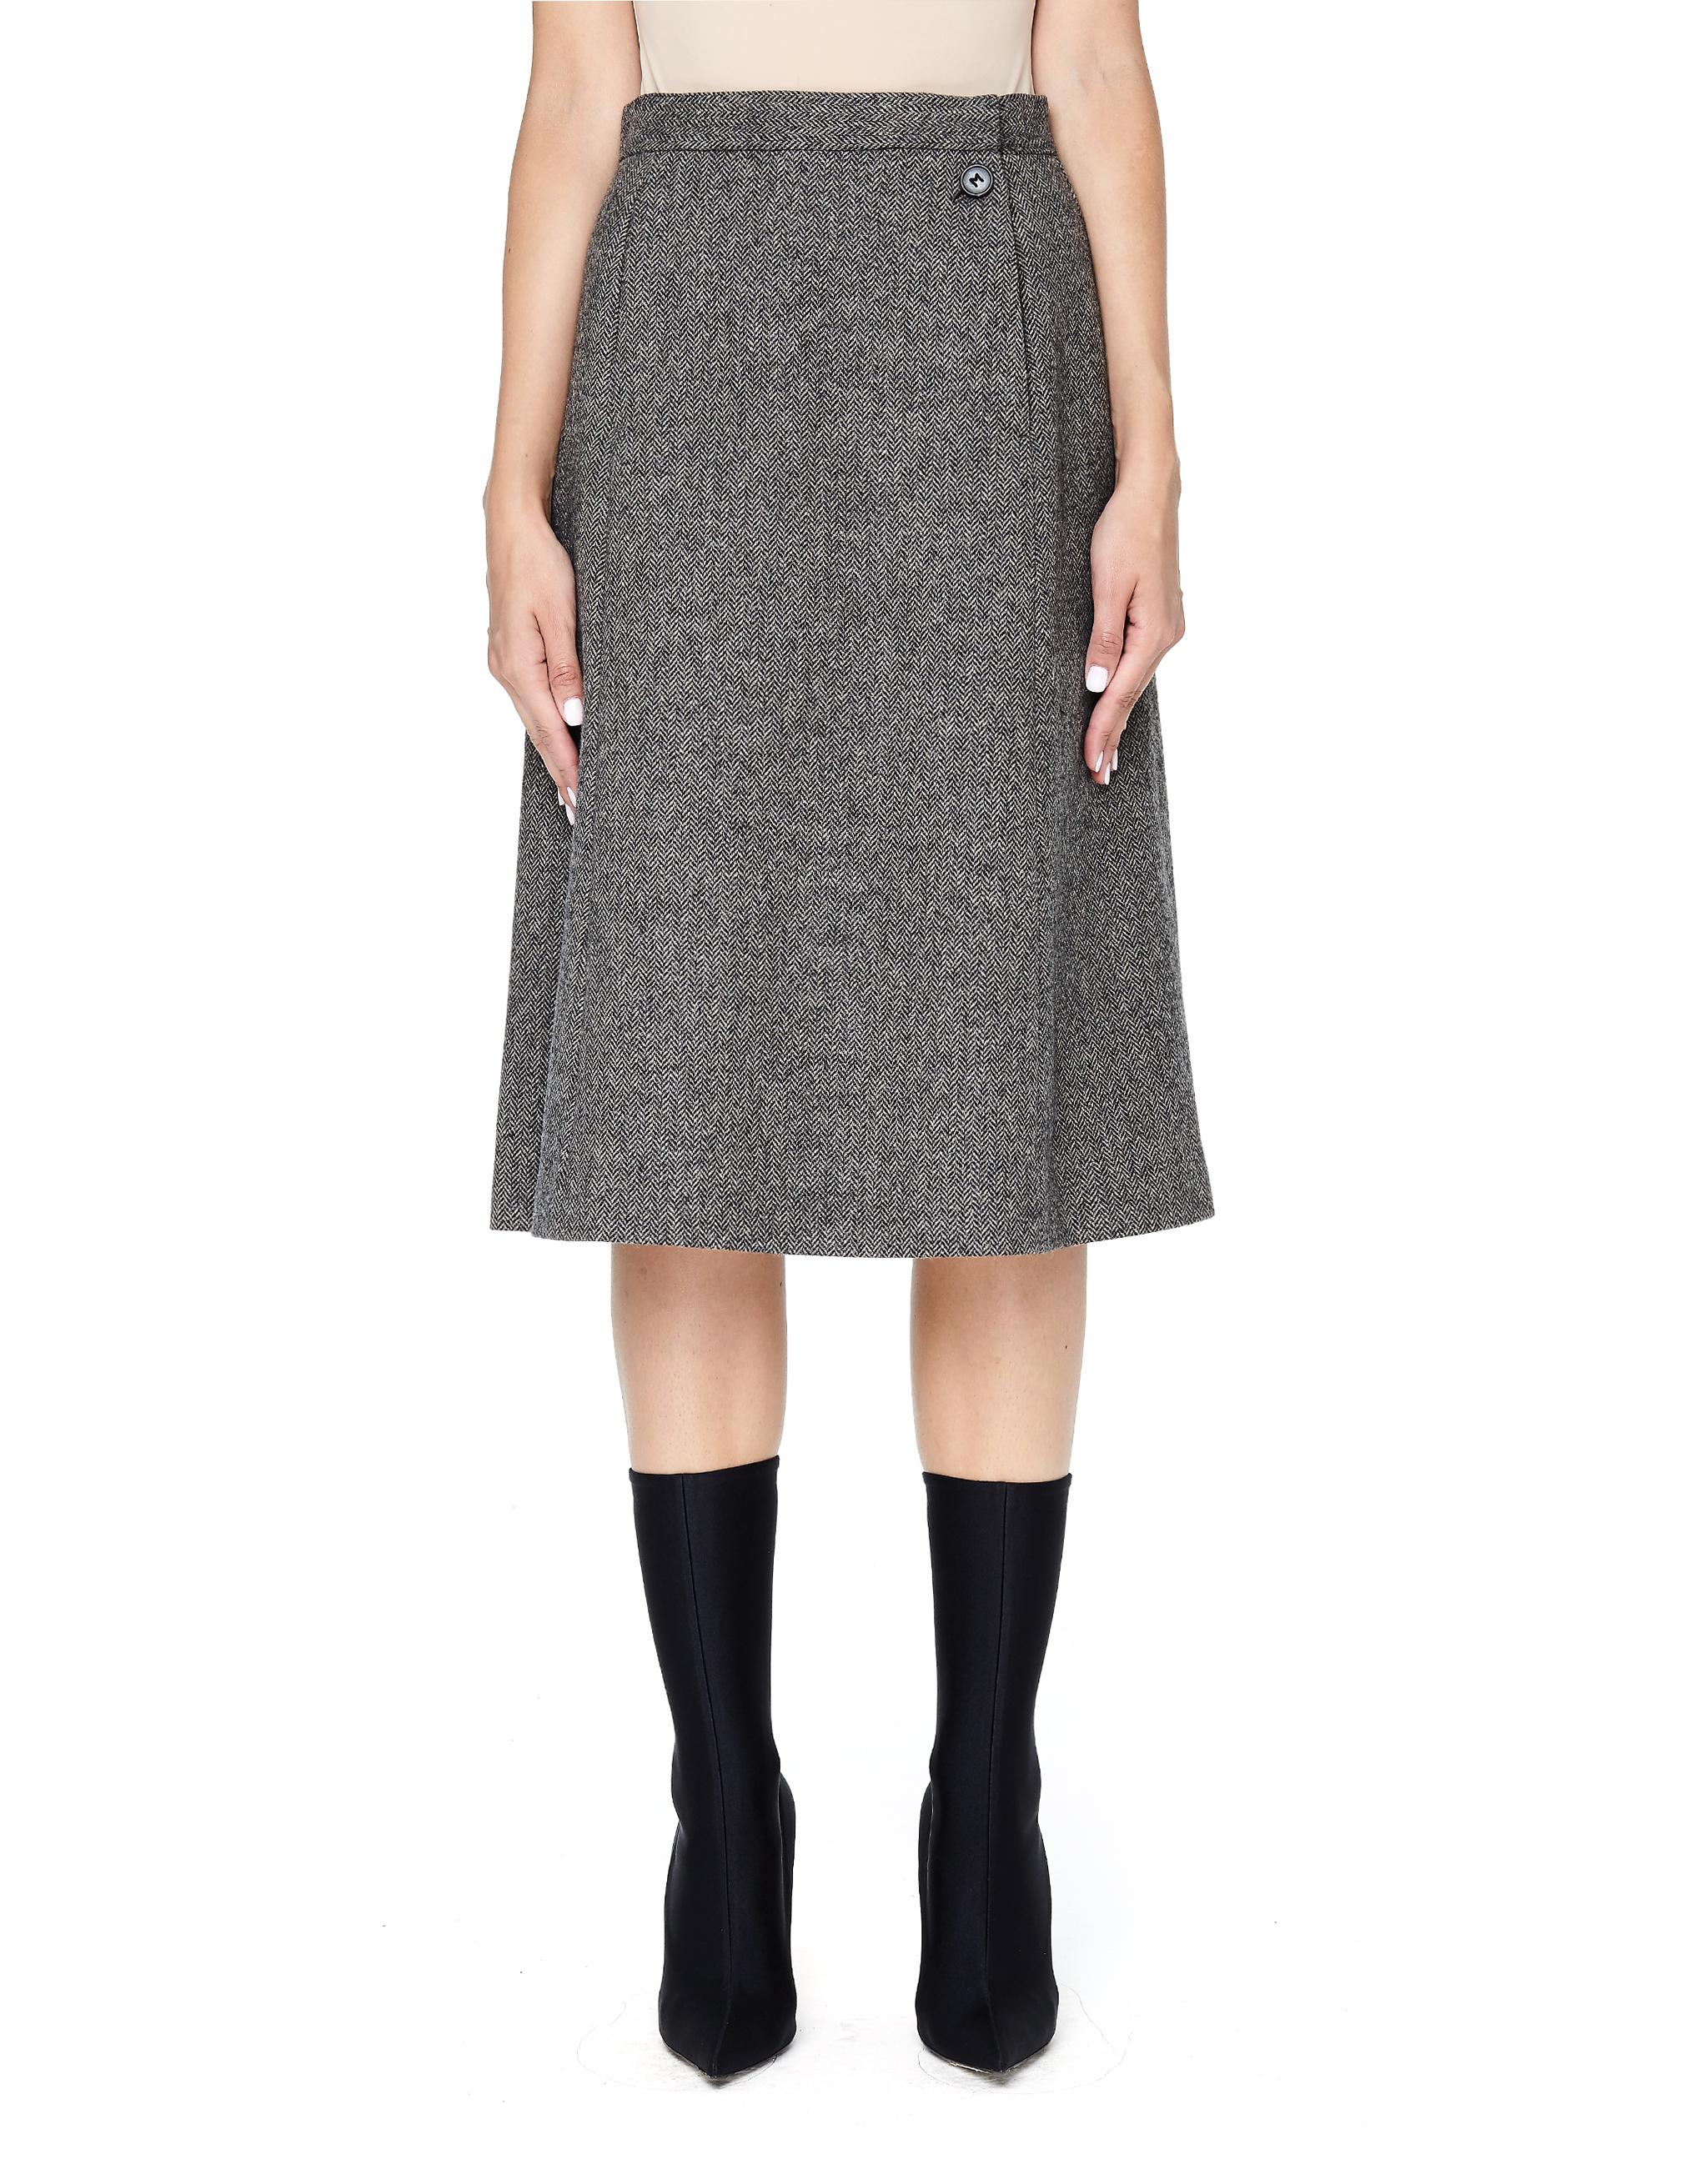 c8cfc4a766 Maison Margiela Herringbone V-shape Tweed Skirt | Garmentory